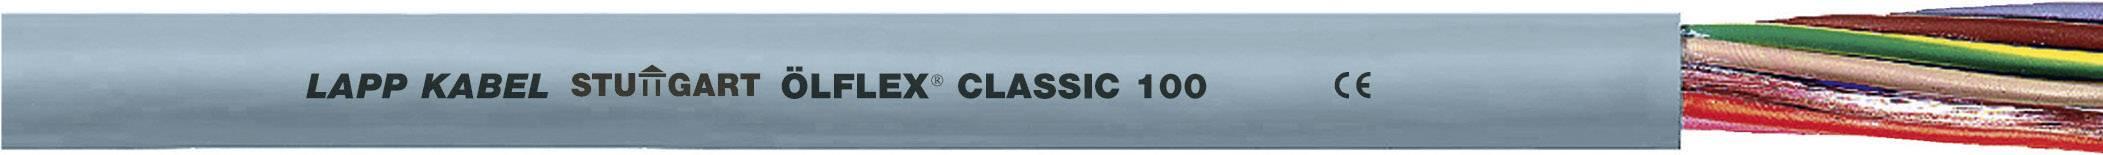 Kabel LappKabel Ölflex CLASSIC 100 18G1 (0010053), PVC, 12,7 mm, 500 V, šedá, 500 m